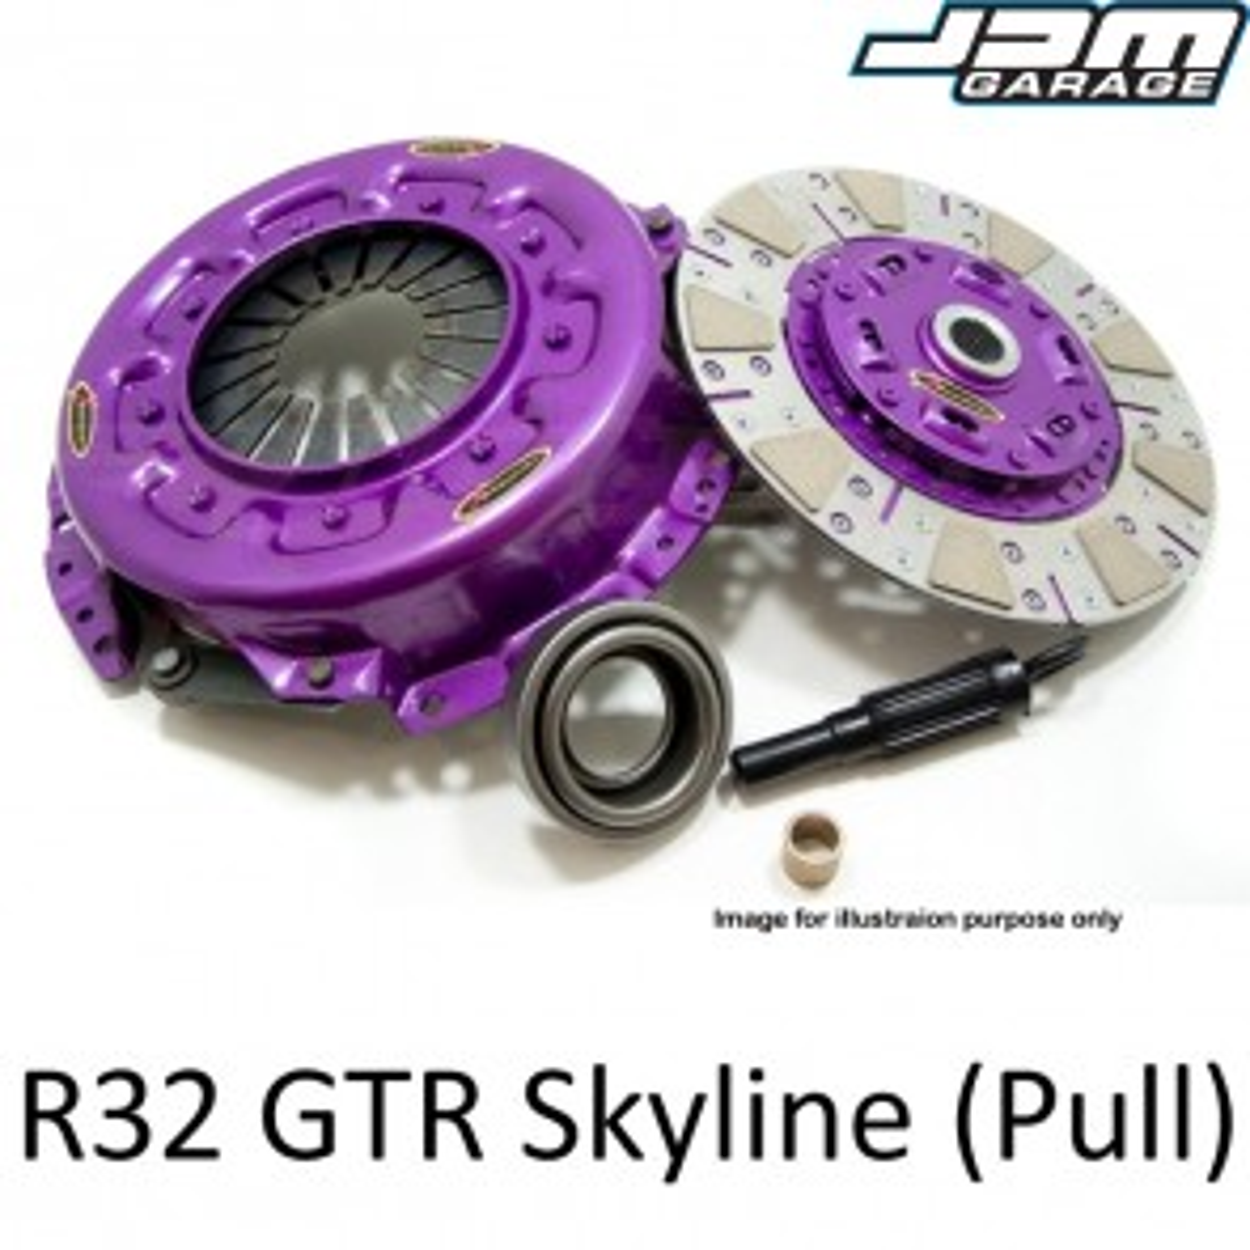 Xtreme Clutch & Flywheel - Organic / Ceramic / Carbon / Single & Twin Plate - Nissan Skyline R32 GTR RB26DETT Late model (Pull-Type)